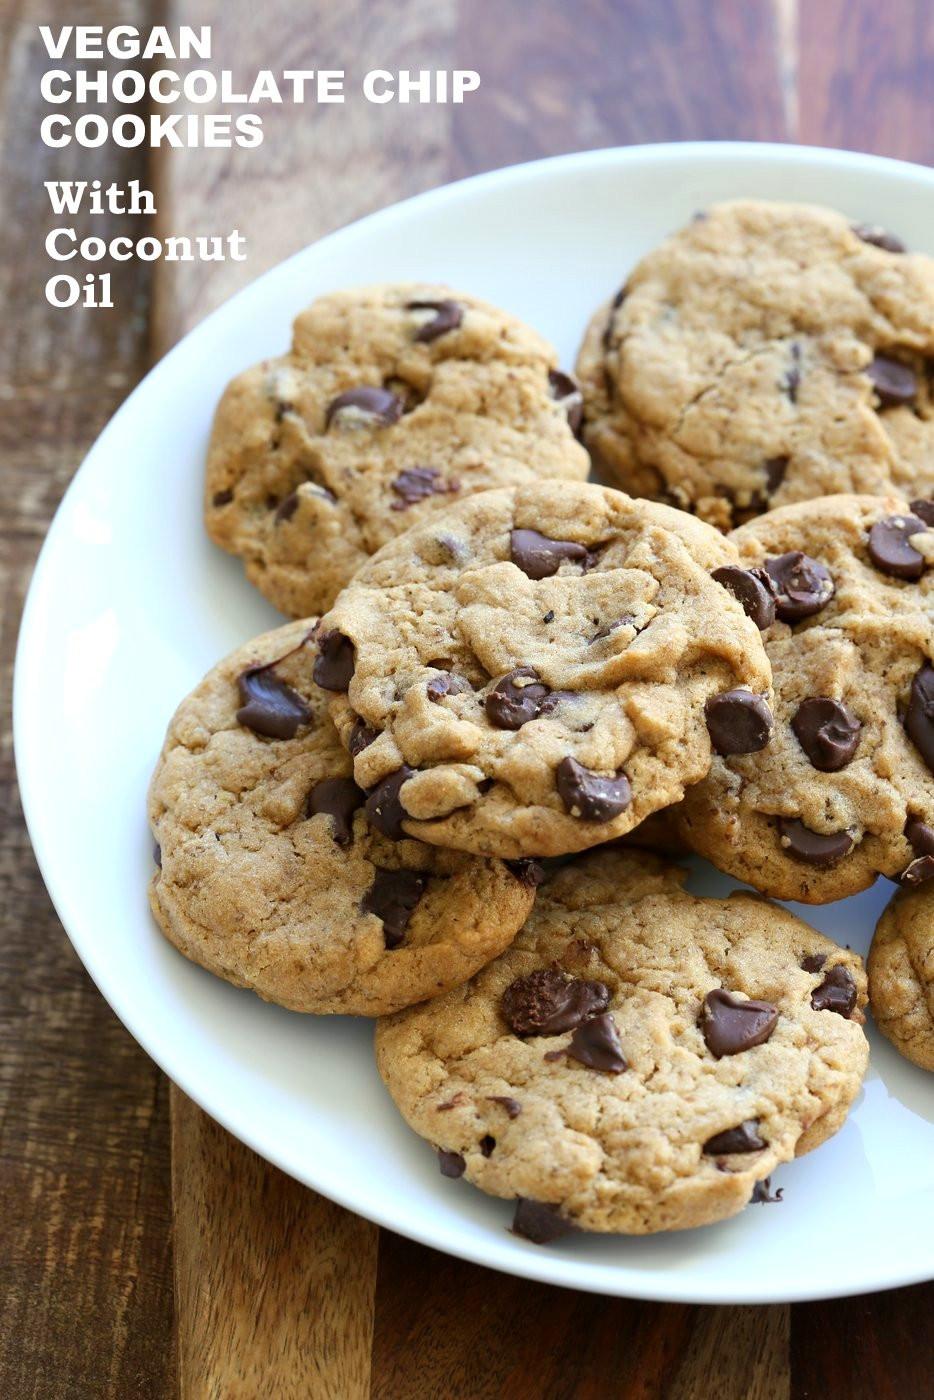 Vegan Chocolate Chip Cookies Recipe  Vegan Chocolate Chip Cookies with Coconut Oil Palm Oil